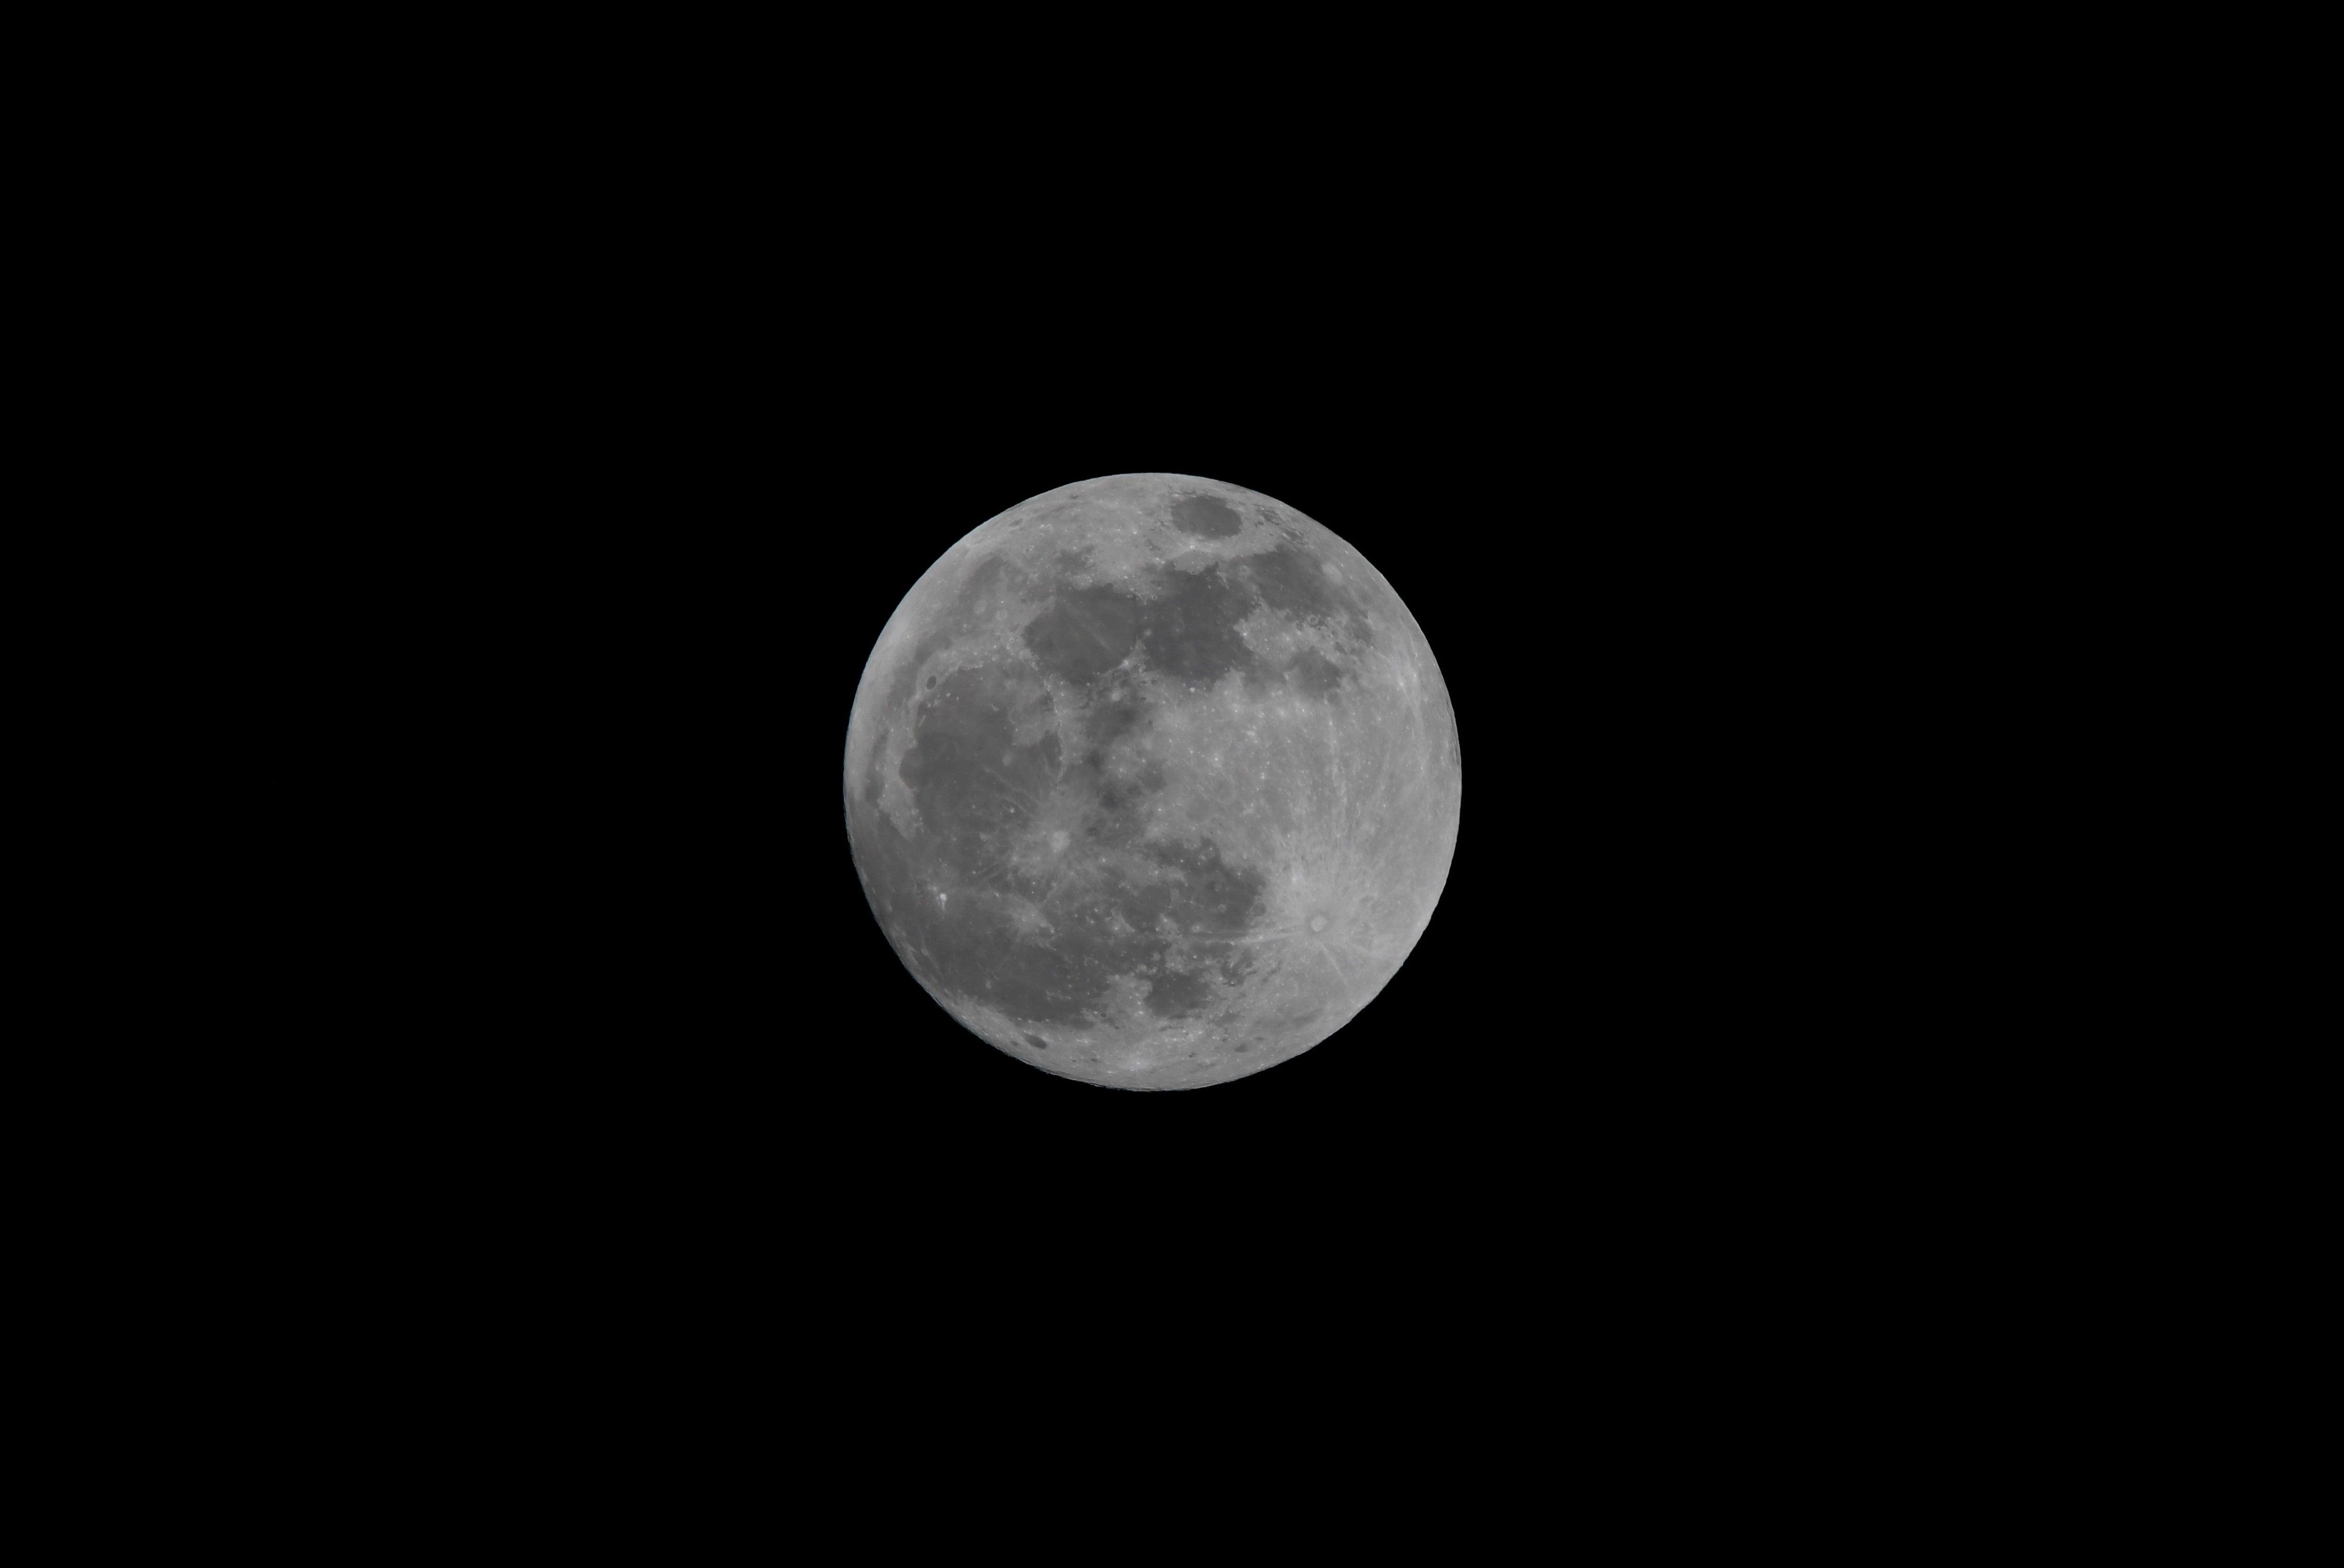 full blue moon lights up the night sky